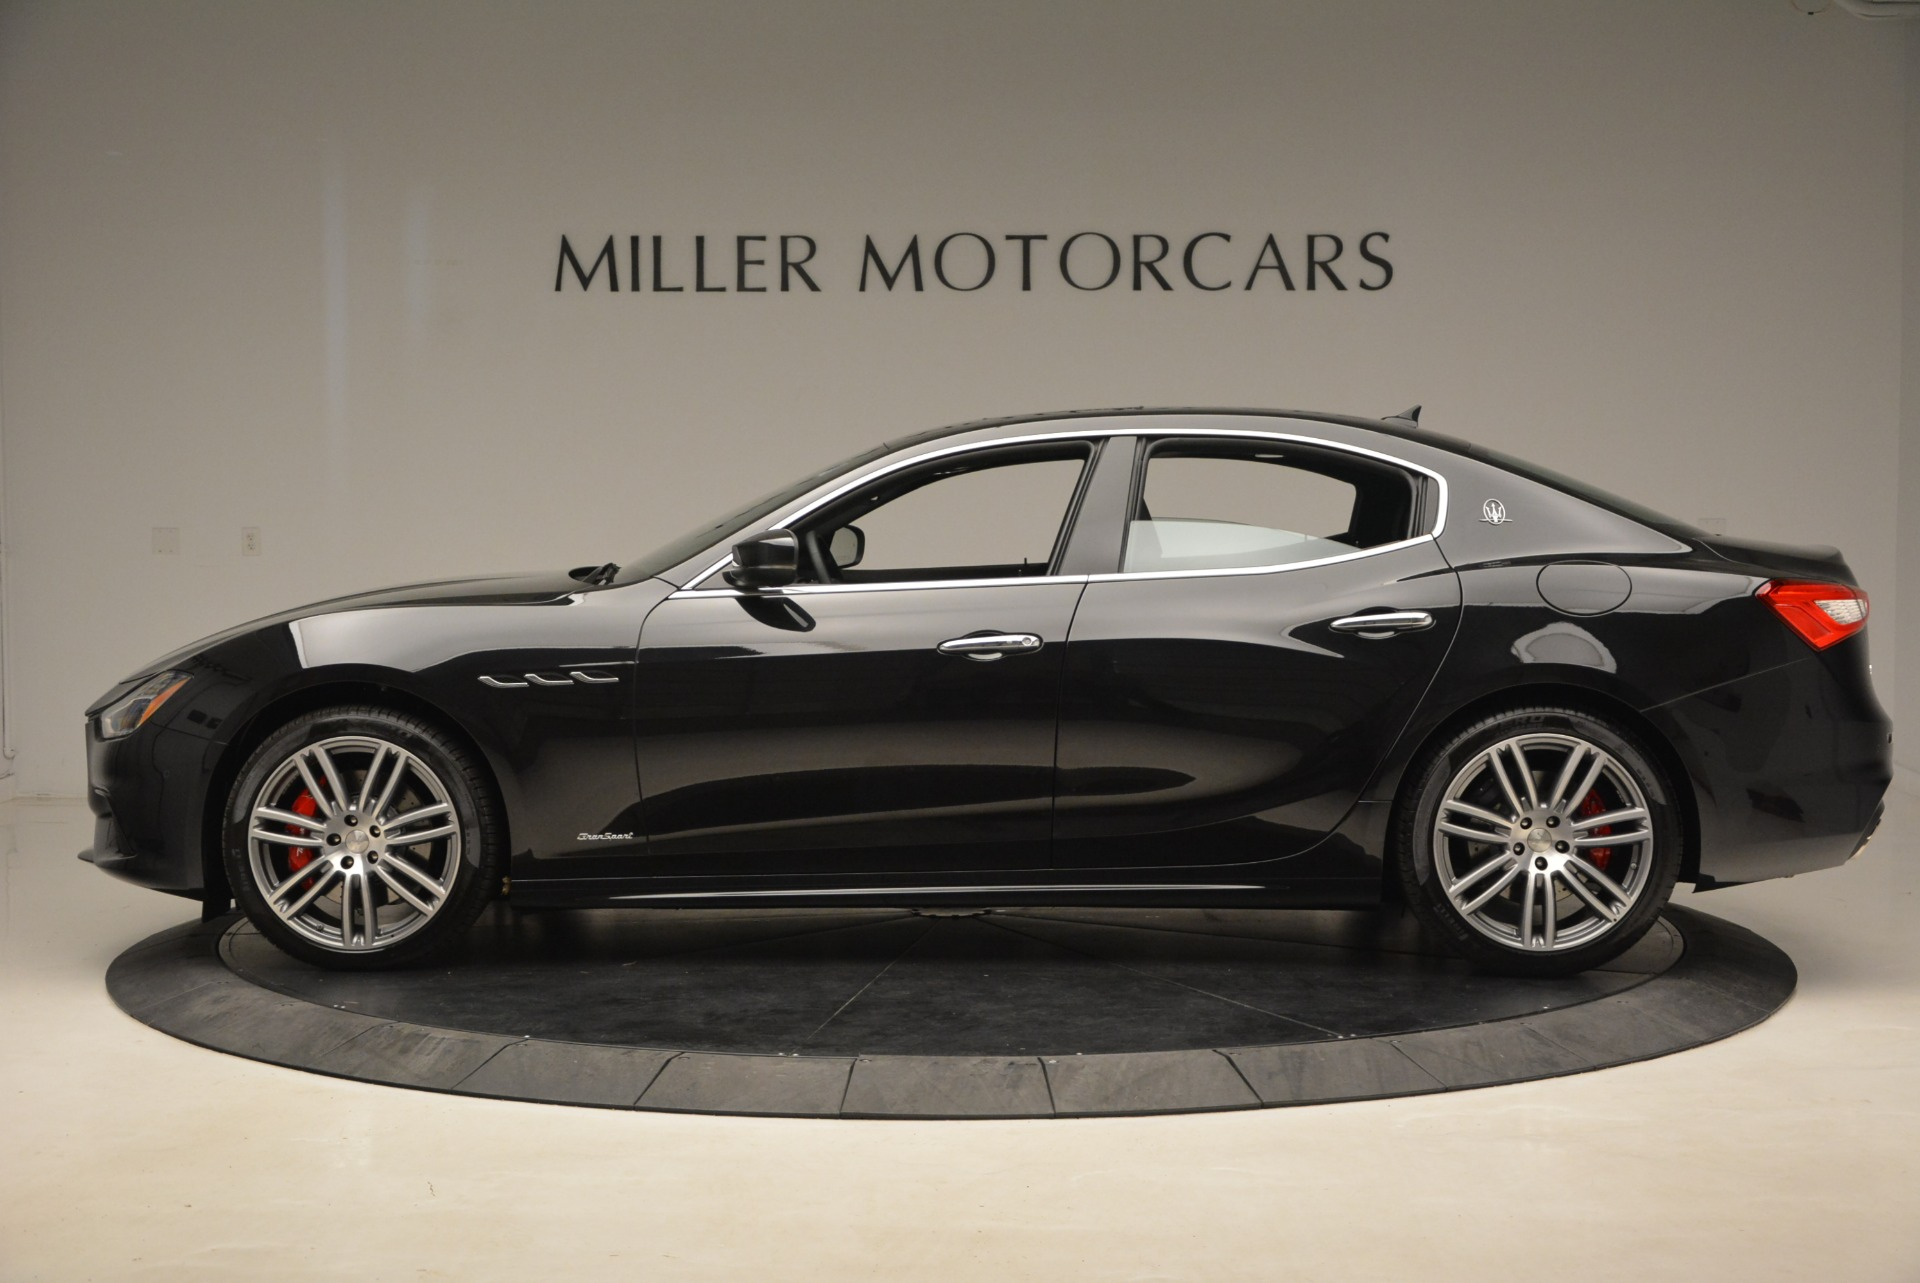 New 2019 Maserati Ghibli S Q4 GranSport For Sale In Westport, CT 2615_p3